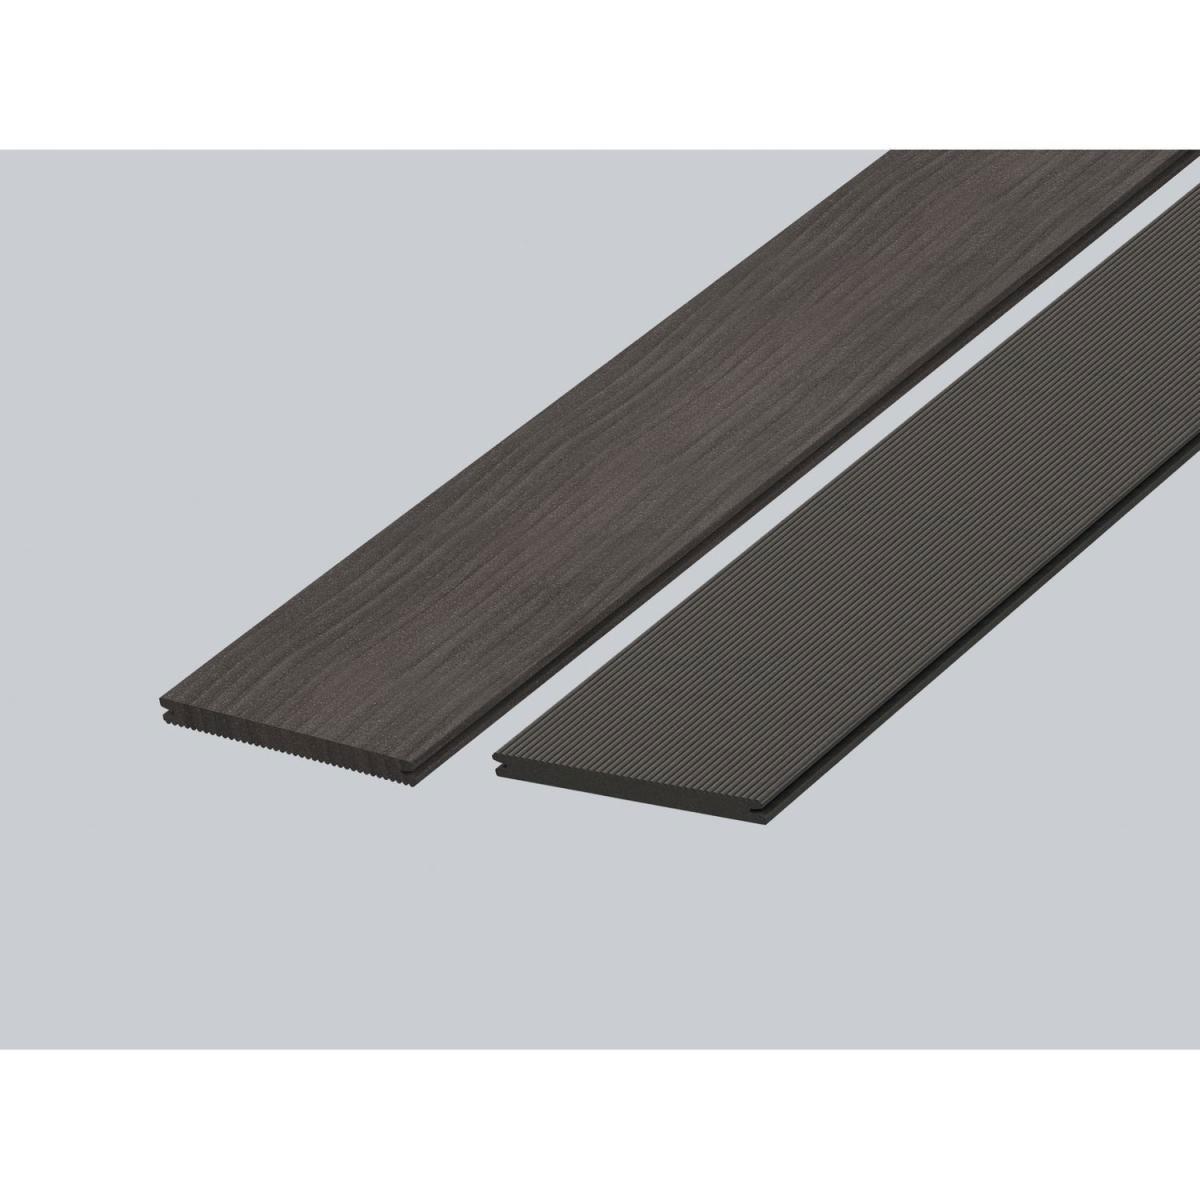 "Rettenmeier Terrassendiele ""Artwood GCC"" grau, 163x16x4000 mm 400x16,3 cm"